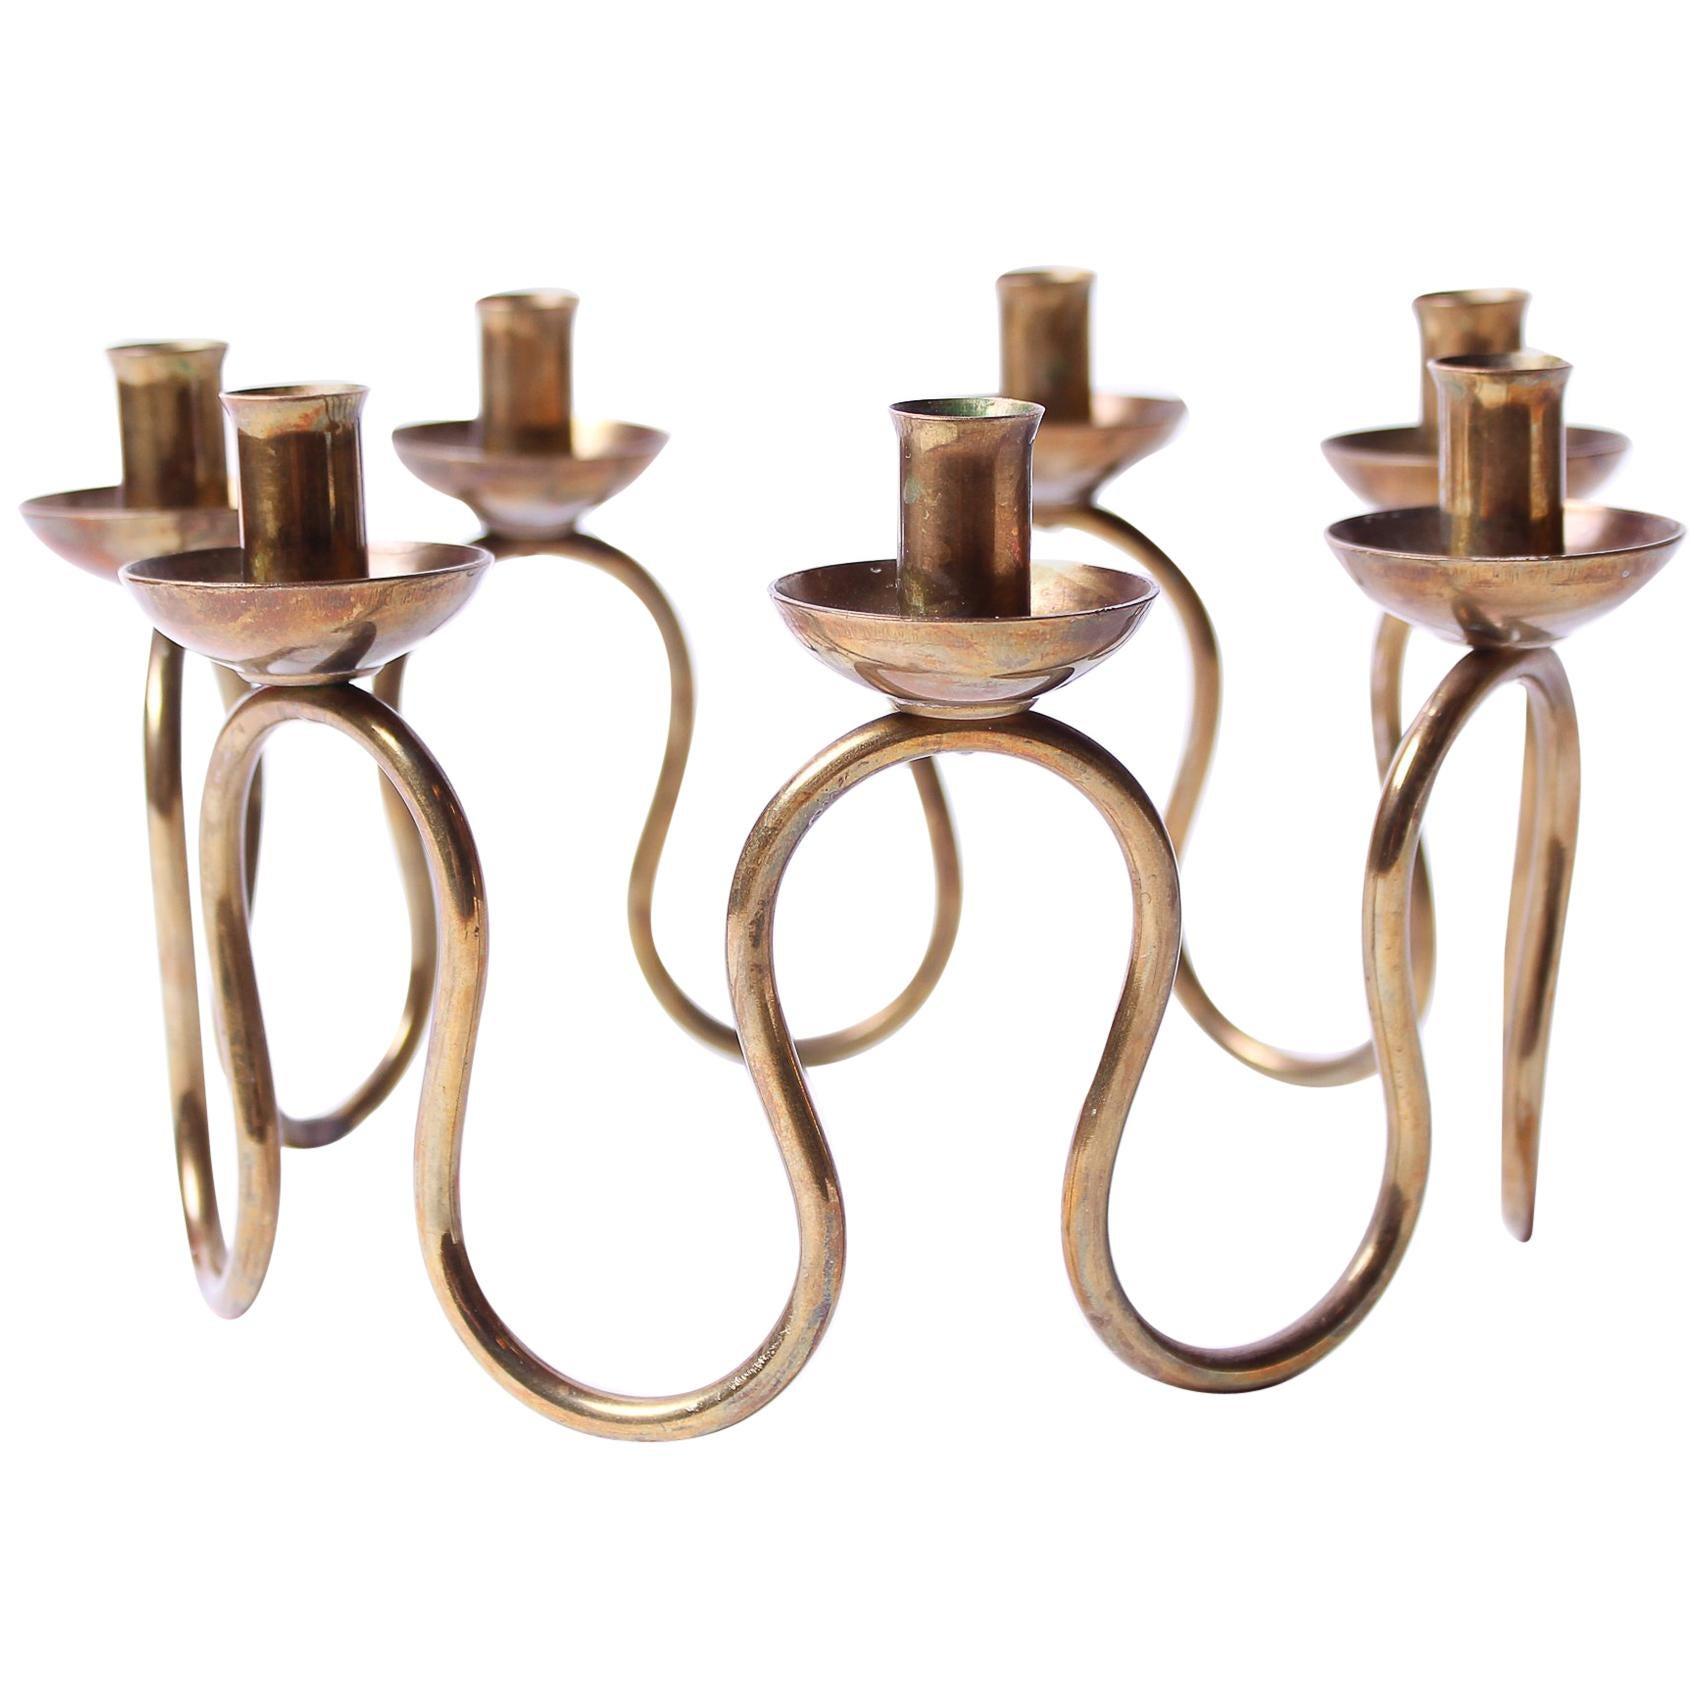 Midcentury Swedish Brass Candlestick by Lars Holmström, 1950s